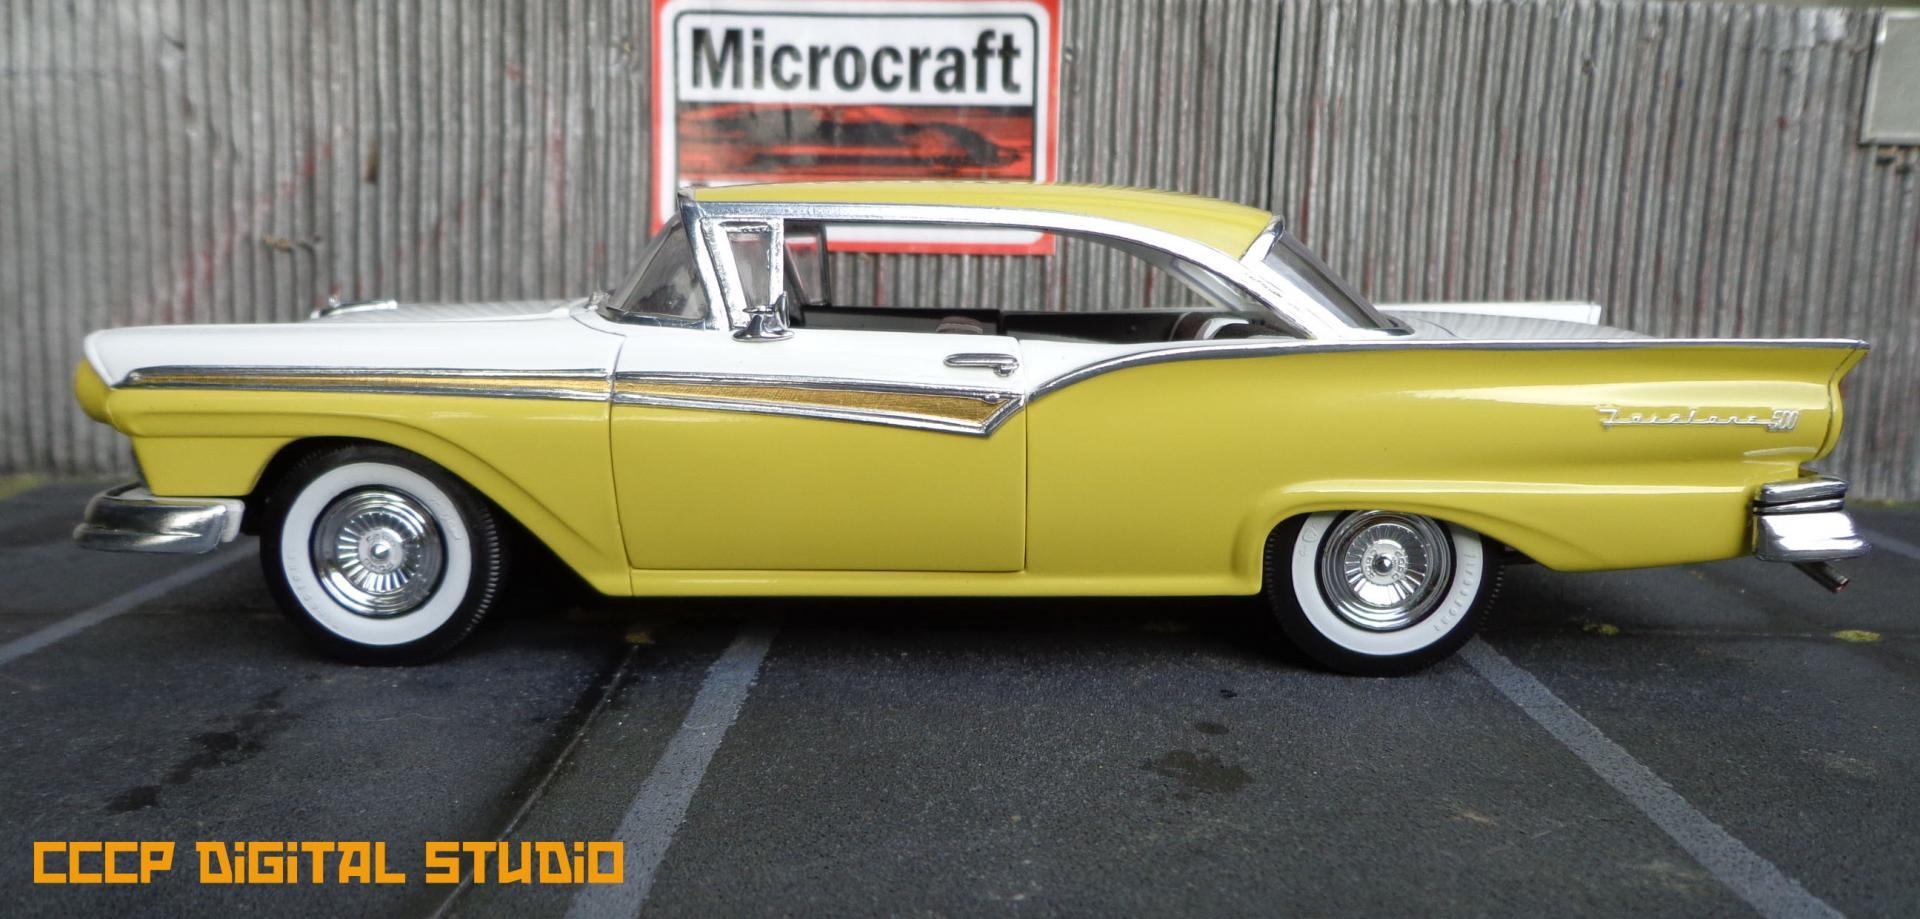 Ford Fairlane 1957 023 copy.jpg